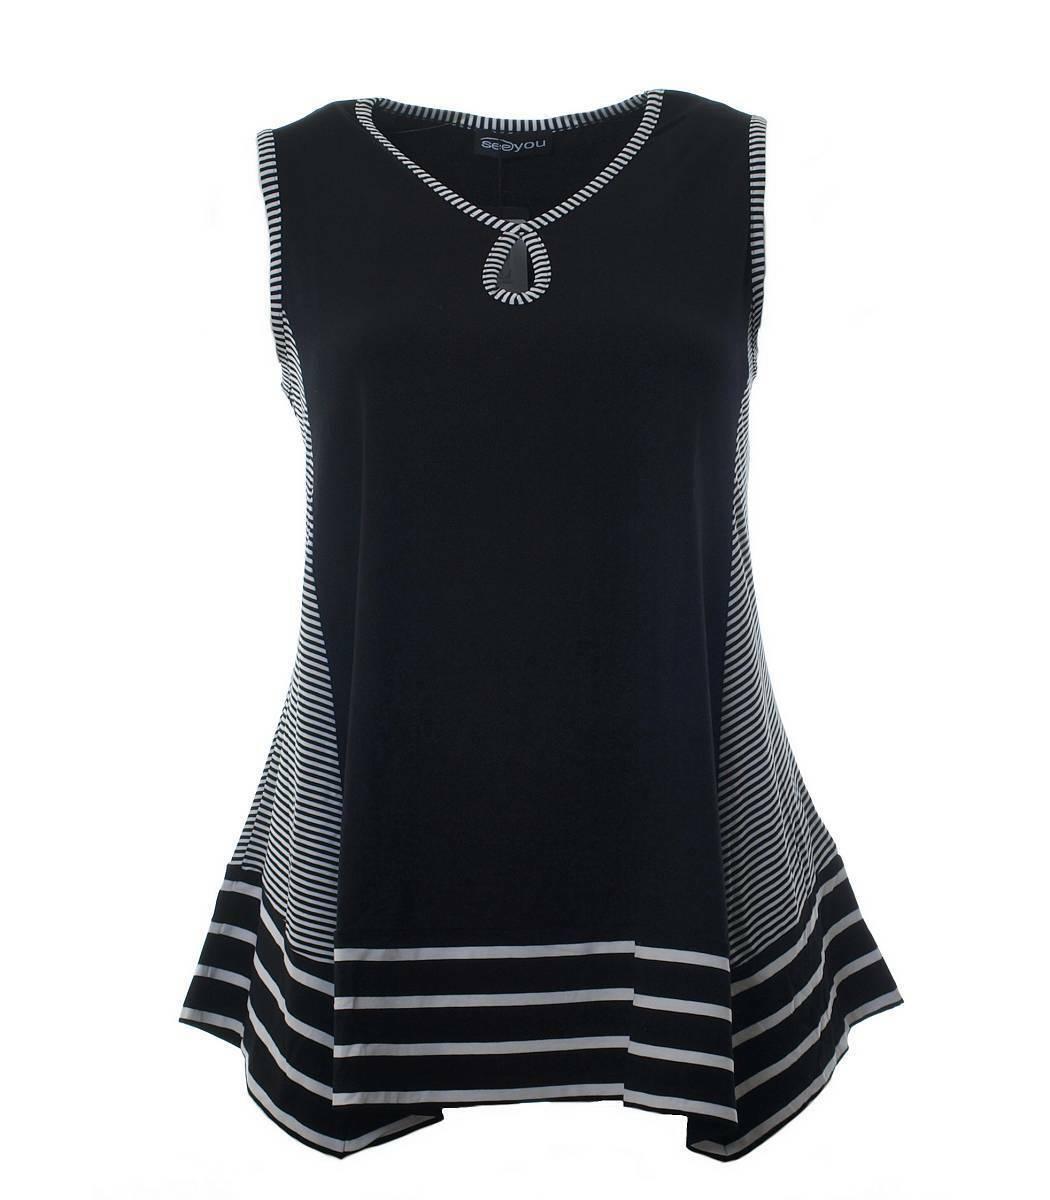 SEEYOU Longtop a-linea a-linea a-linea Stretch Top senza maniche per donna nero XXL 8fd894